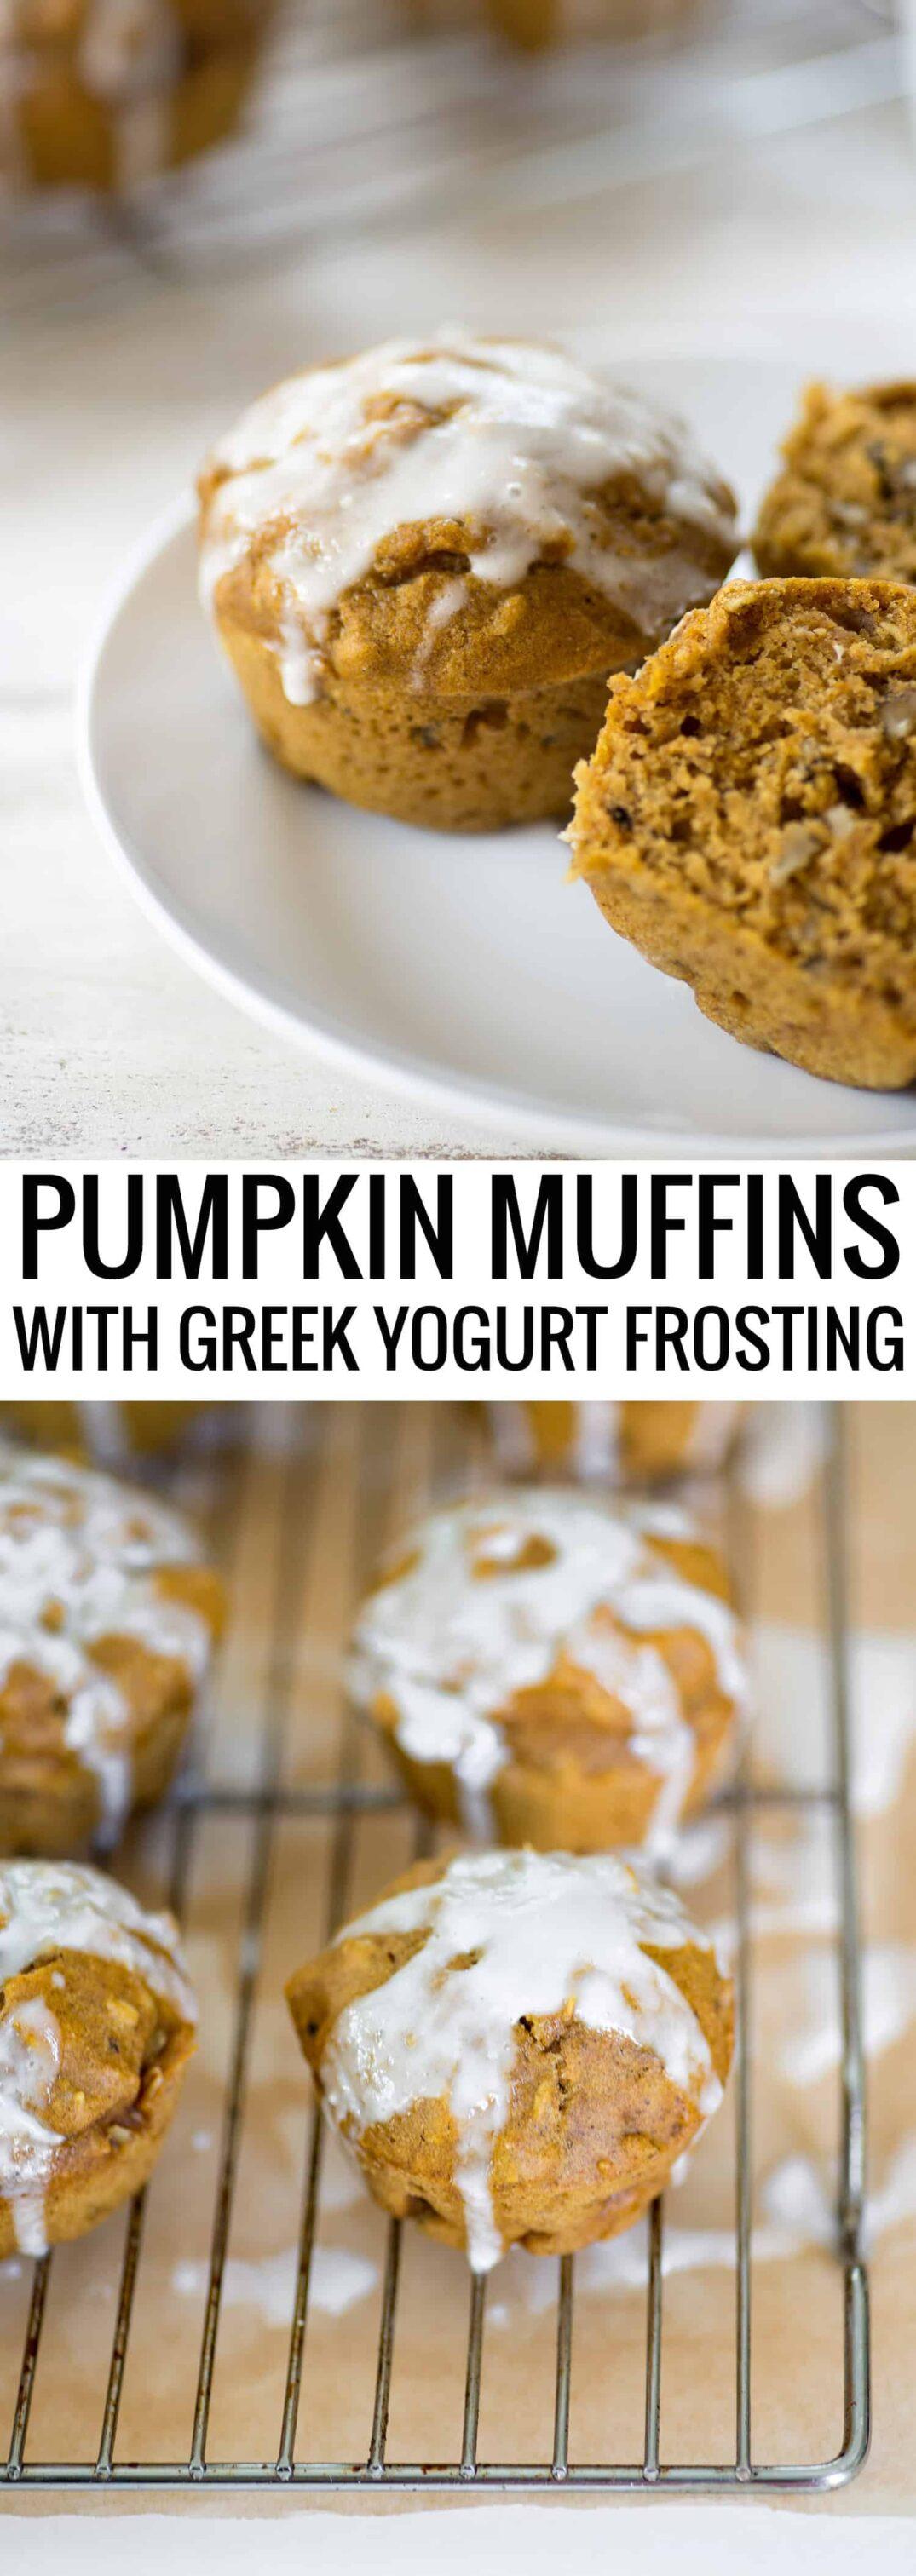 Pumpkin Muffins with Greek Yogurt Frosting! You've gotta try these healthy, low-fat muffins covered in a greek yogurt glaze. #vegetarian #baking #pumpkin #muffins | www.delishknowledge.com